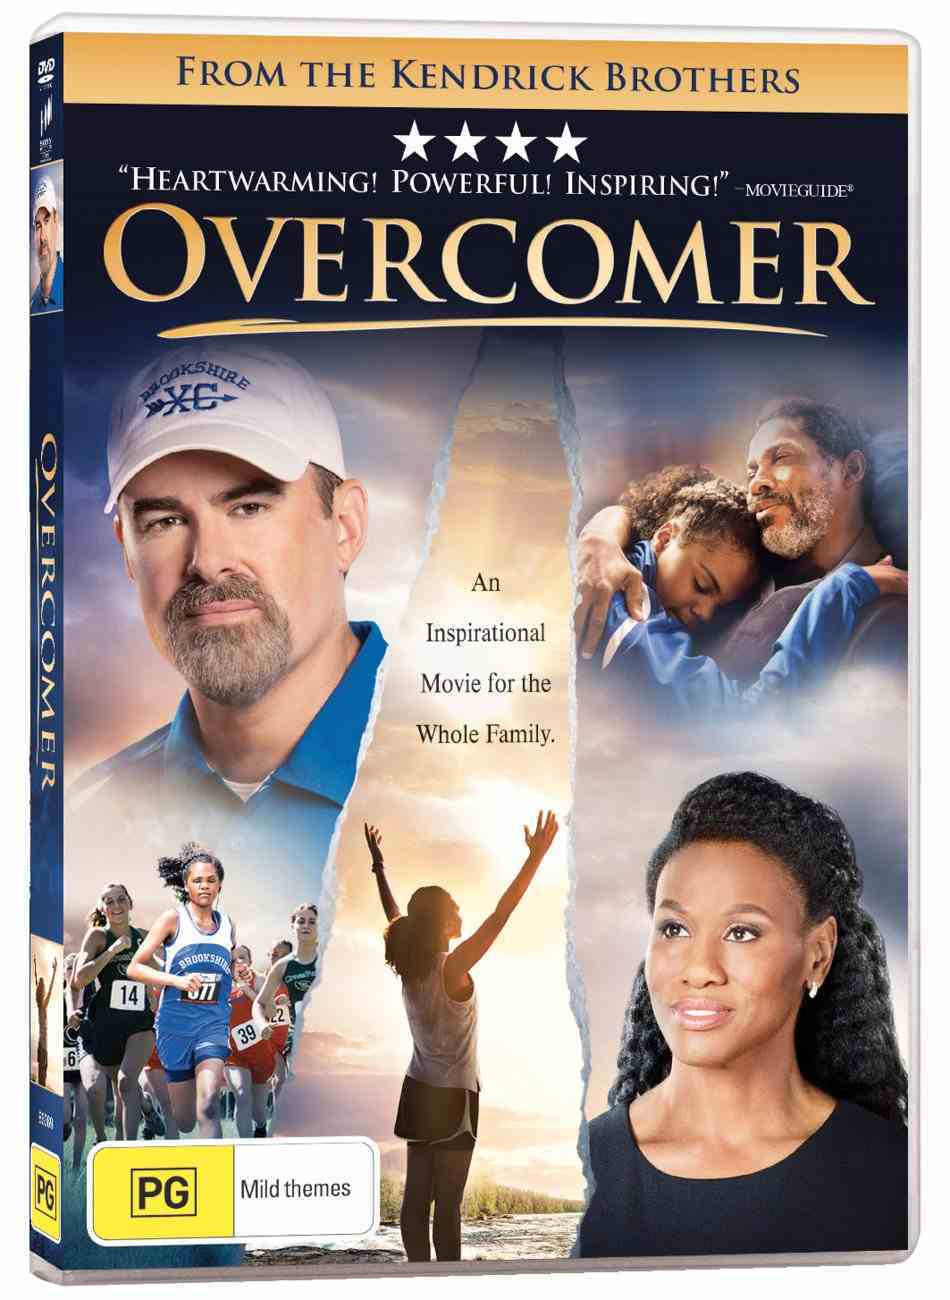 Overcomer Movie DVD